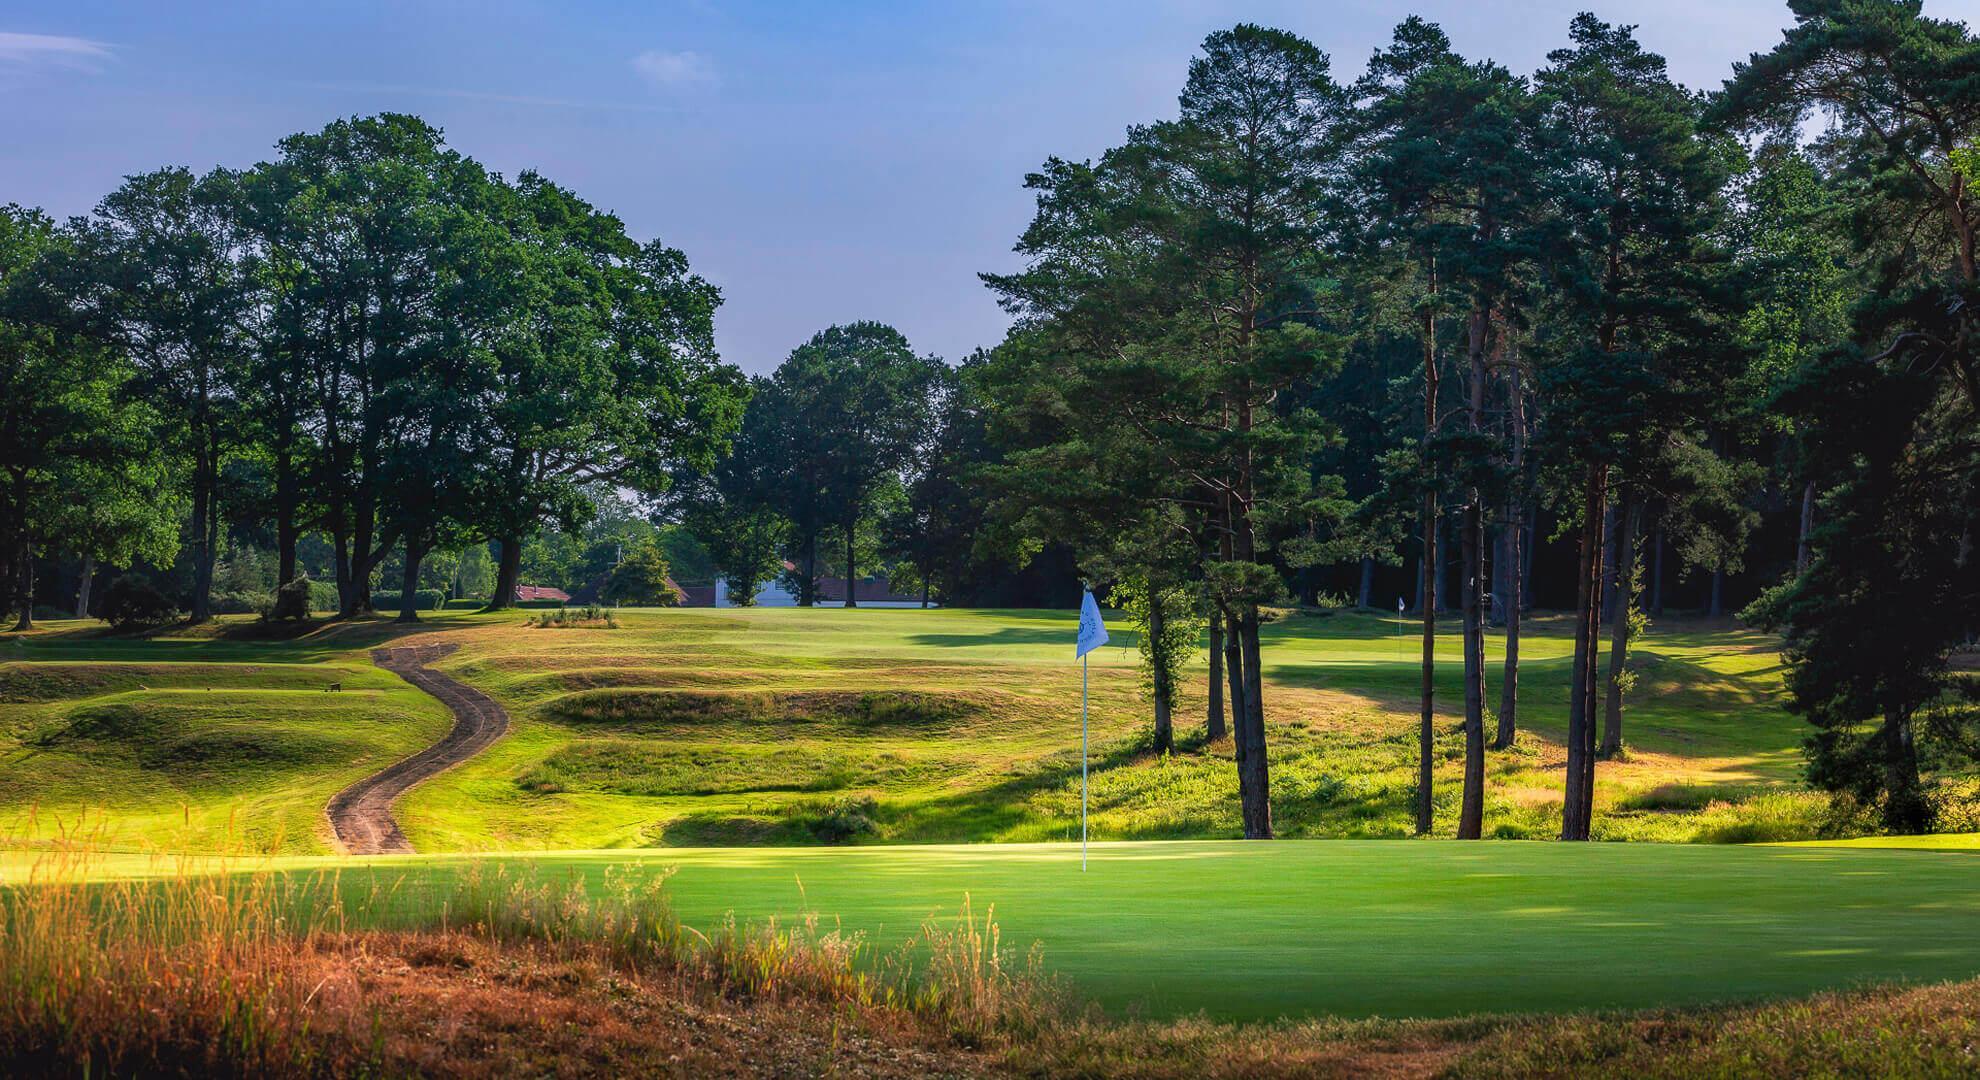 Woking Golf Course, South East England